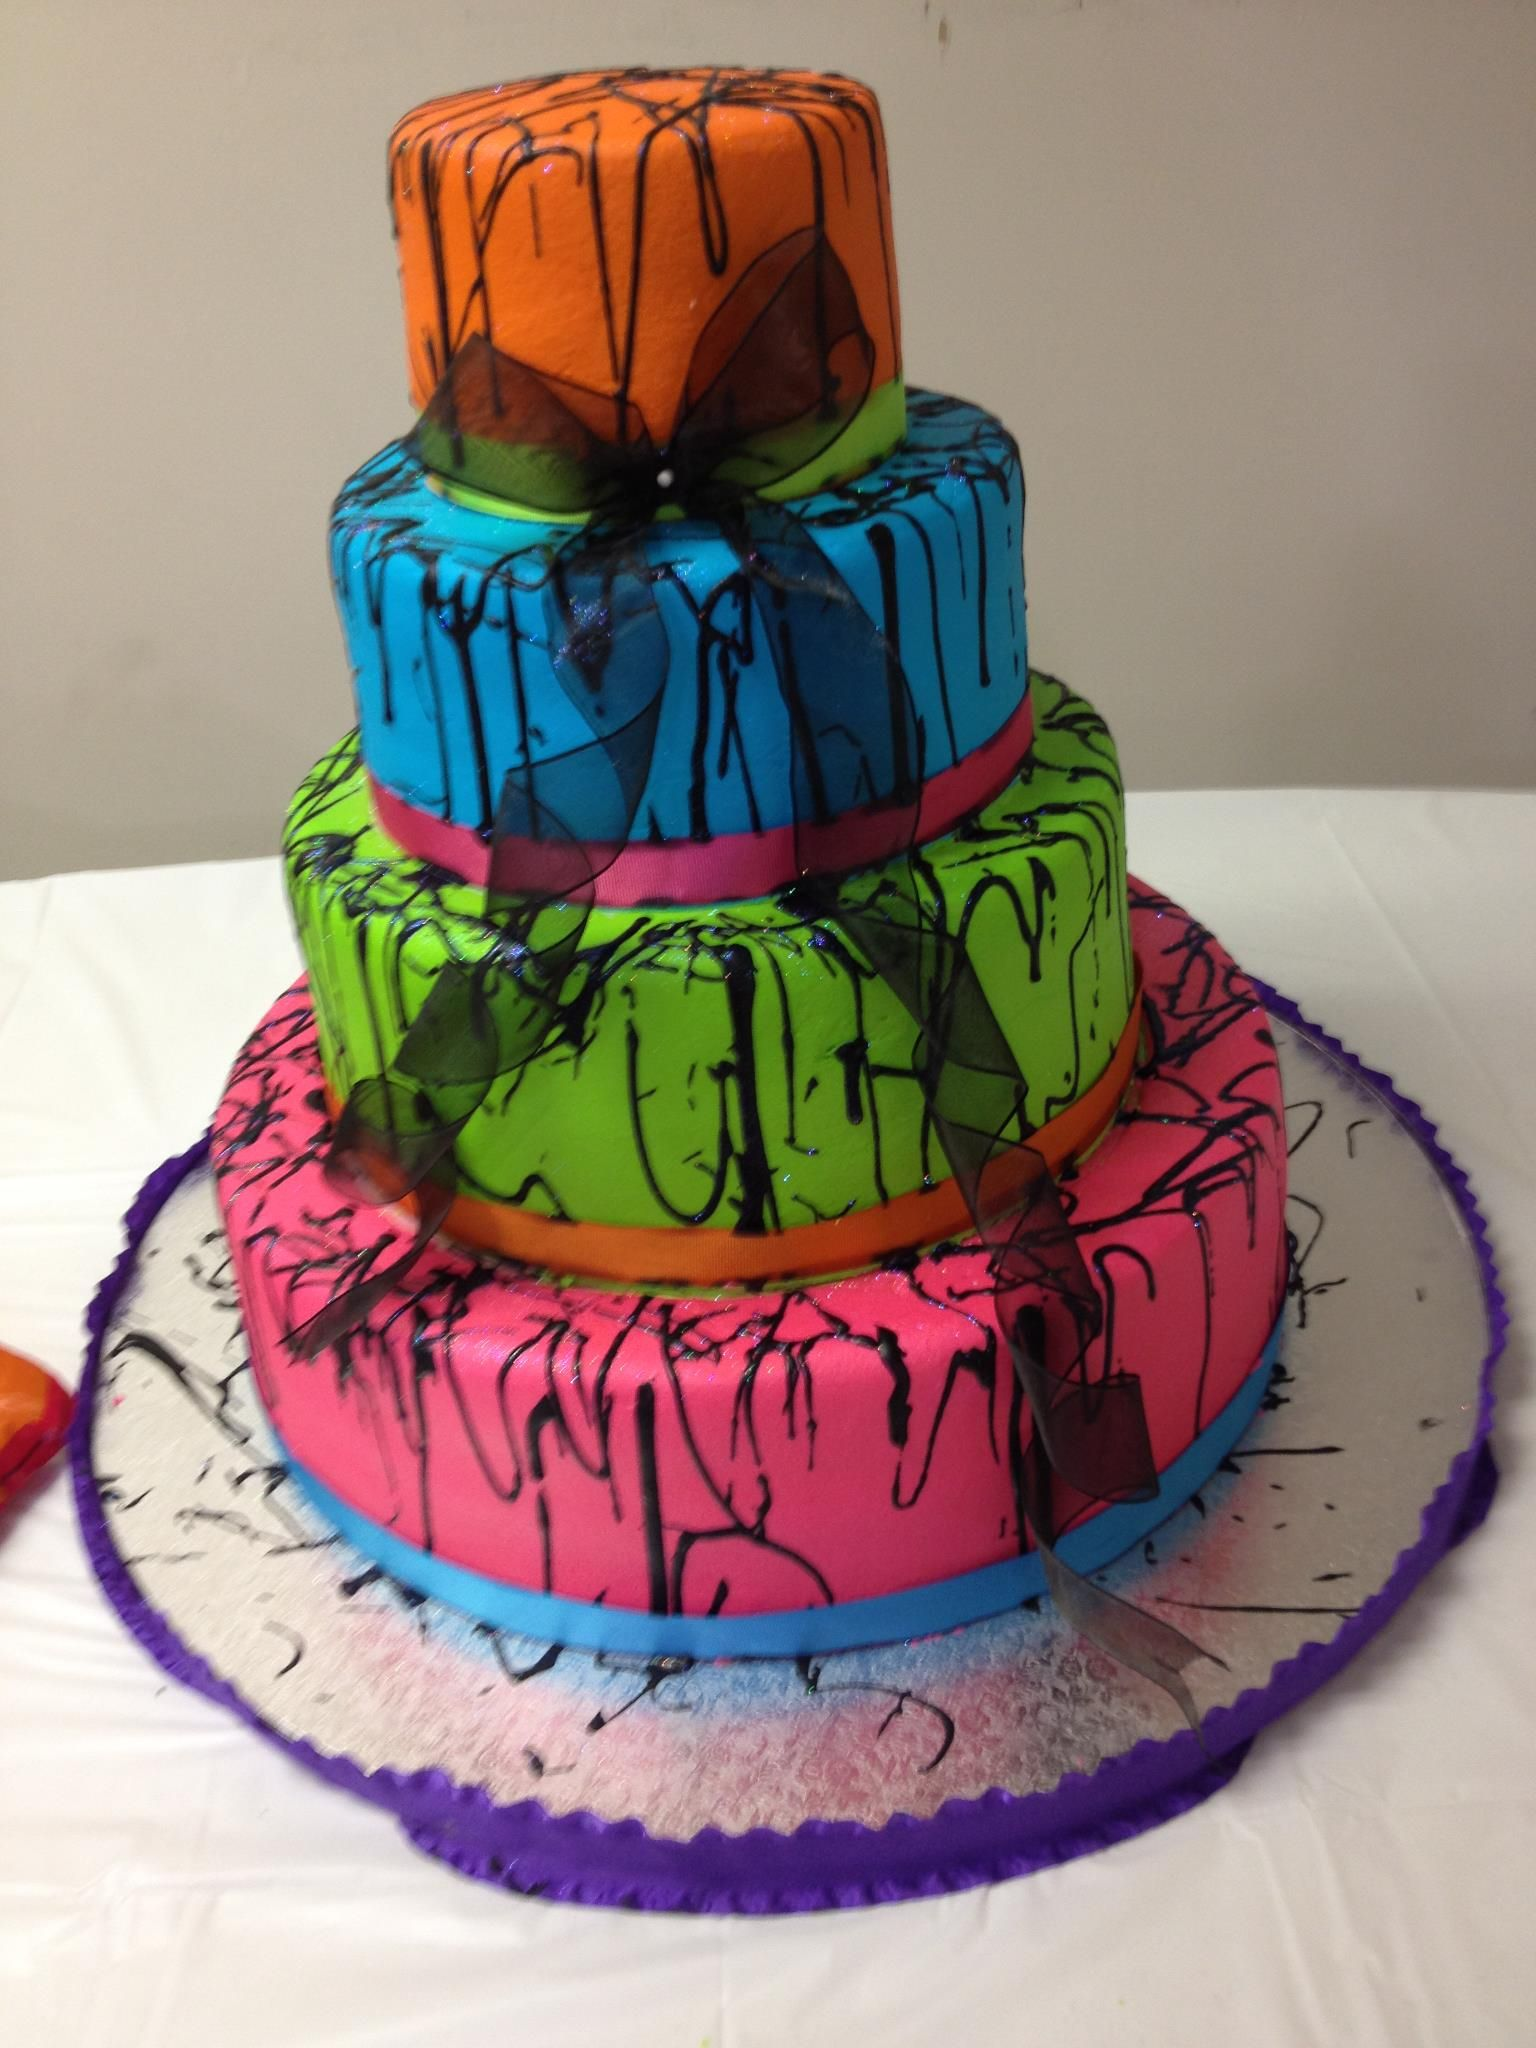 Magnificent Brittnies 80S Theme Graduation Party Cake Anns Bakery Tulsa Personalised Birthday Cards Veneteletsinfo